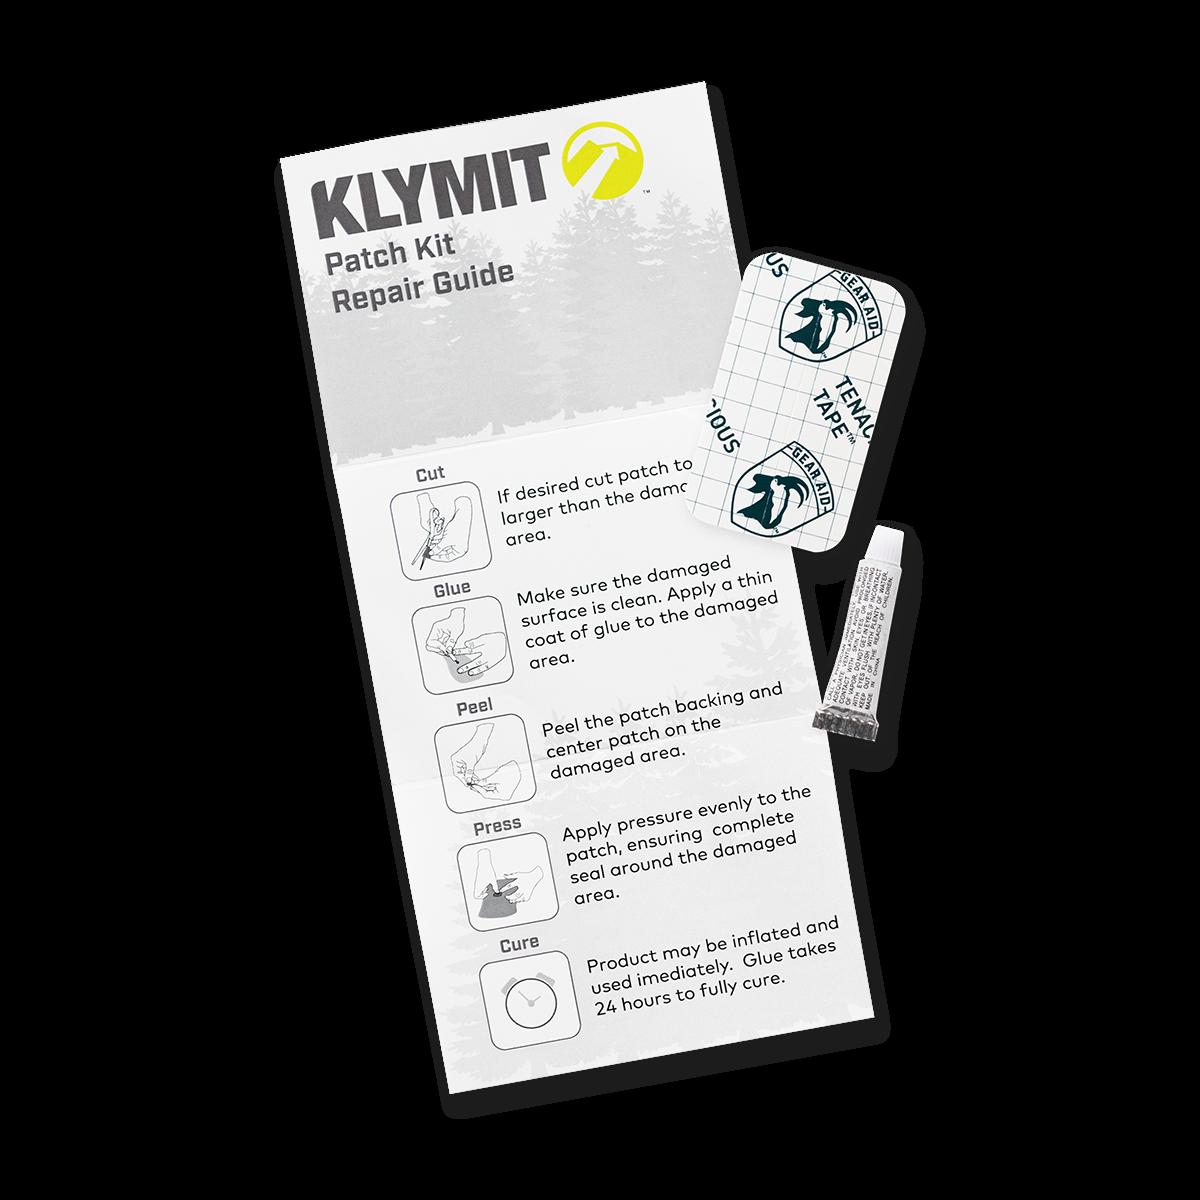 KLYMIT Sleeping Pad PATCH KIT with glue and tenacious tape B